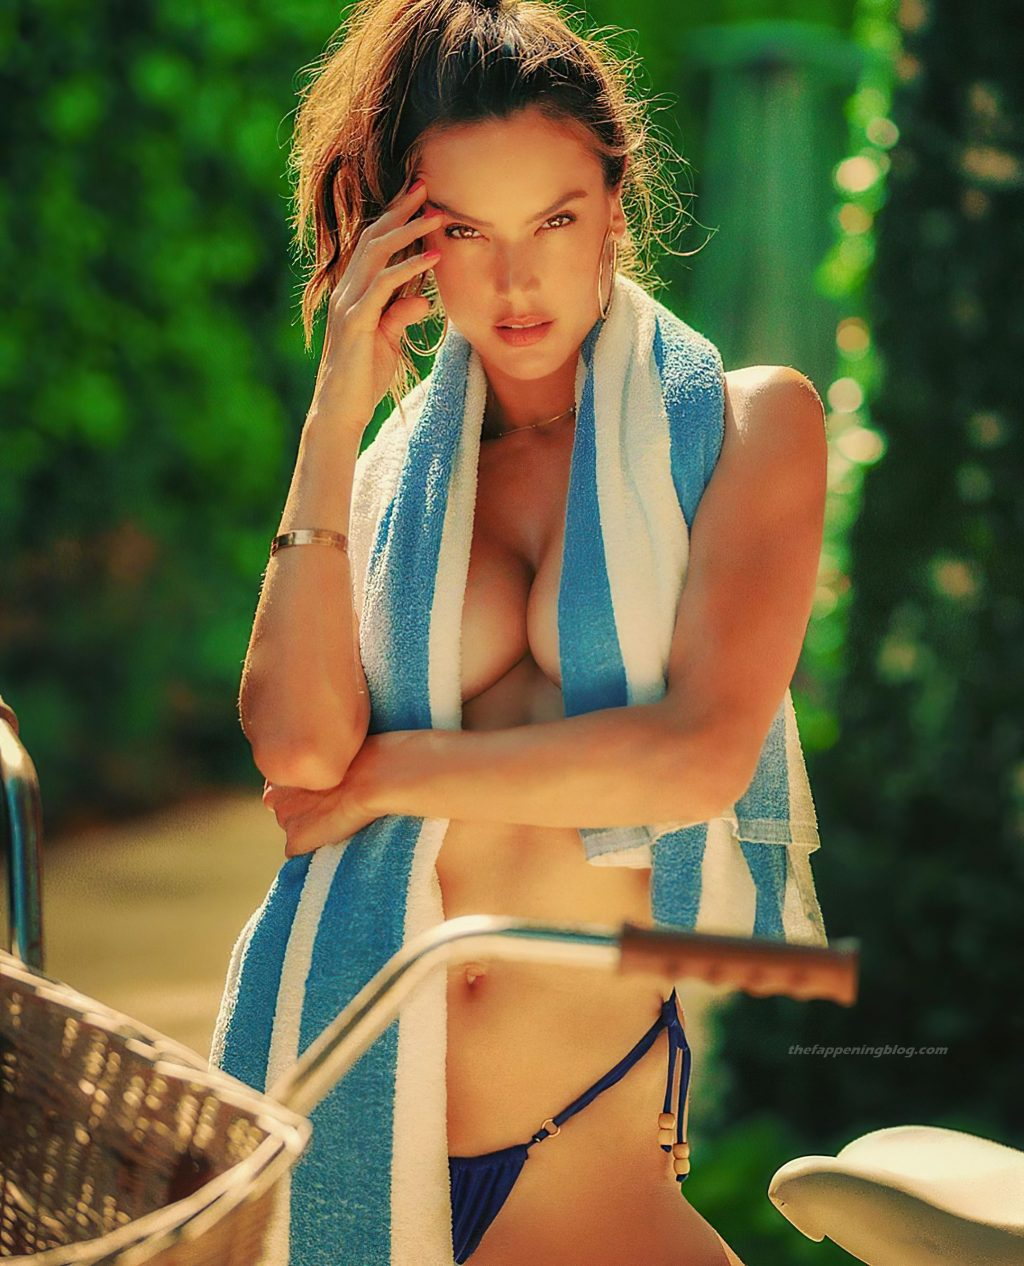 Alessandra Ambrosio Topless (5 New Photos)